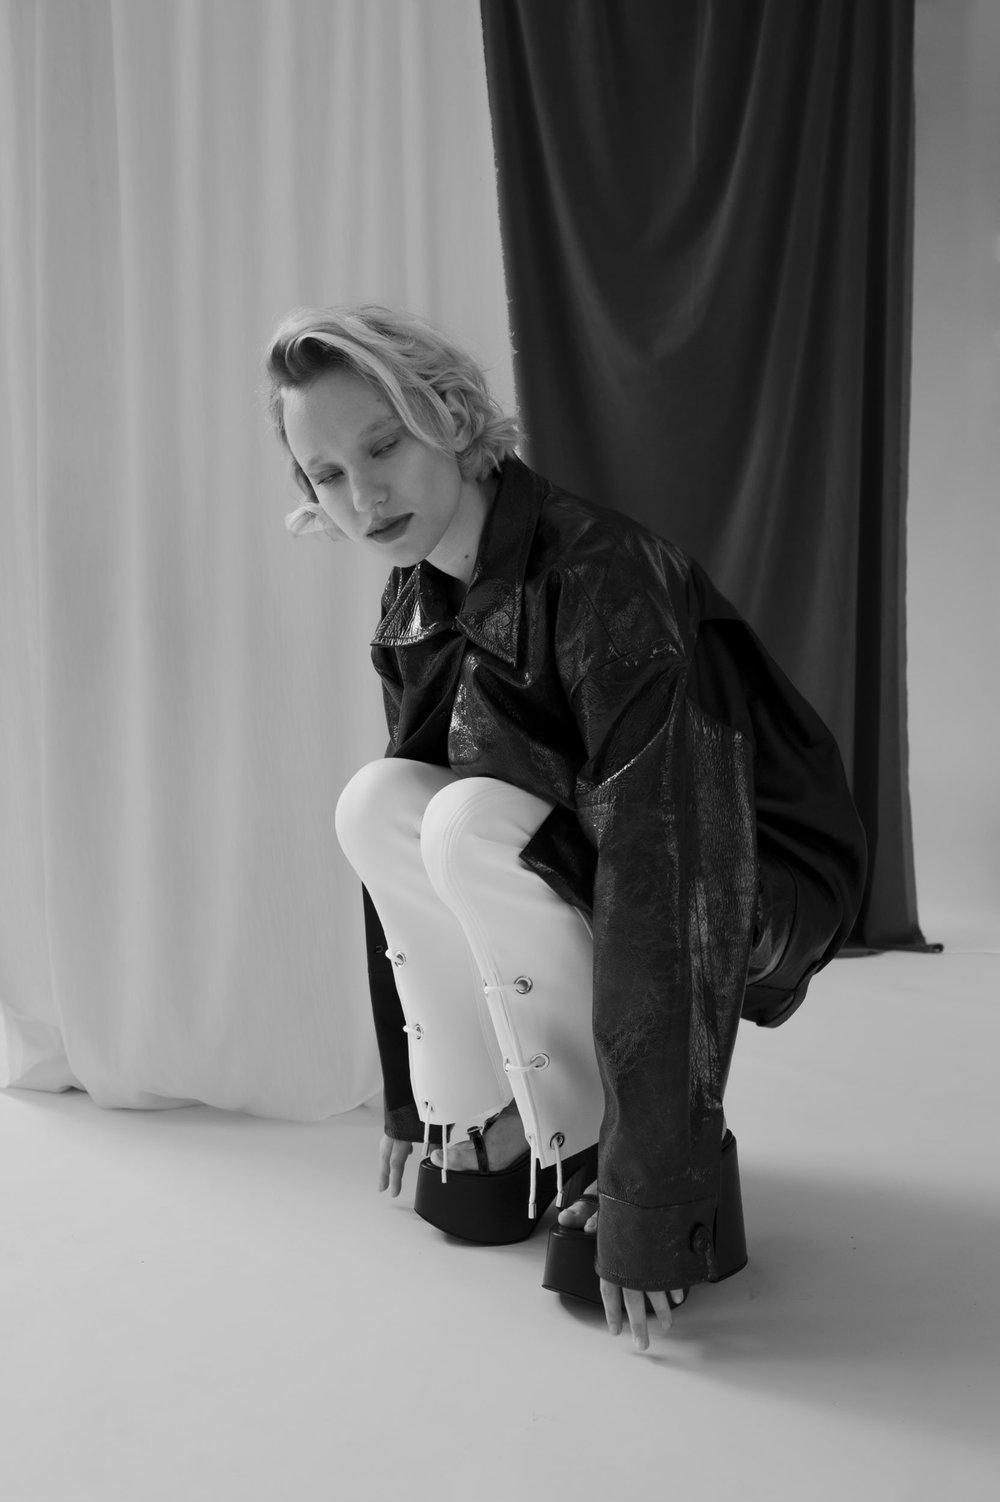 Jacket - Litkovskaya, Pants - Marine Henrion, Shoes - Jour/ne.